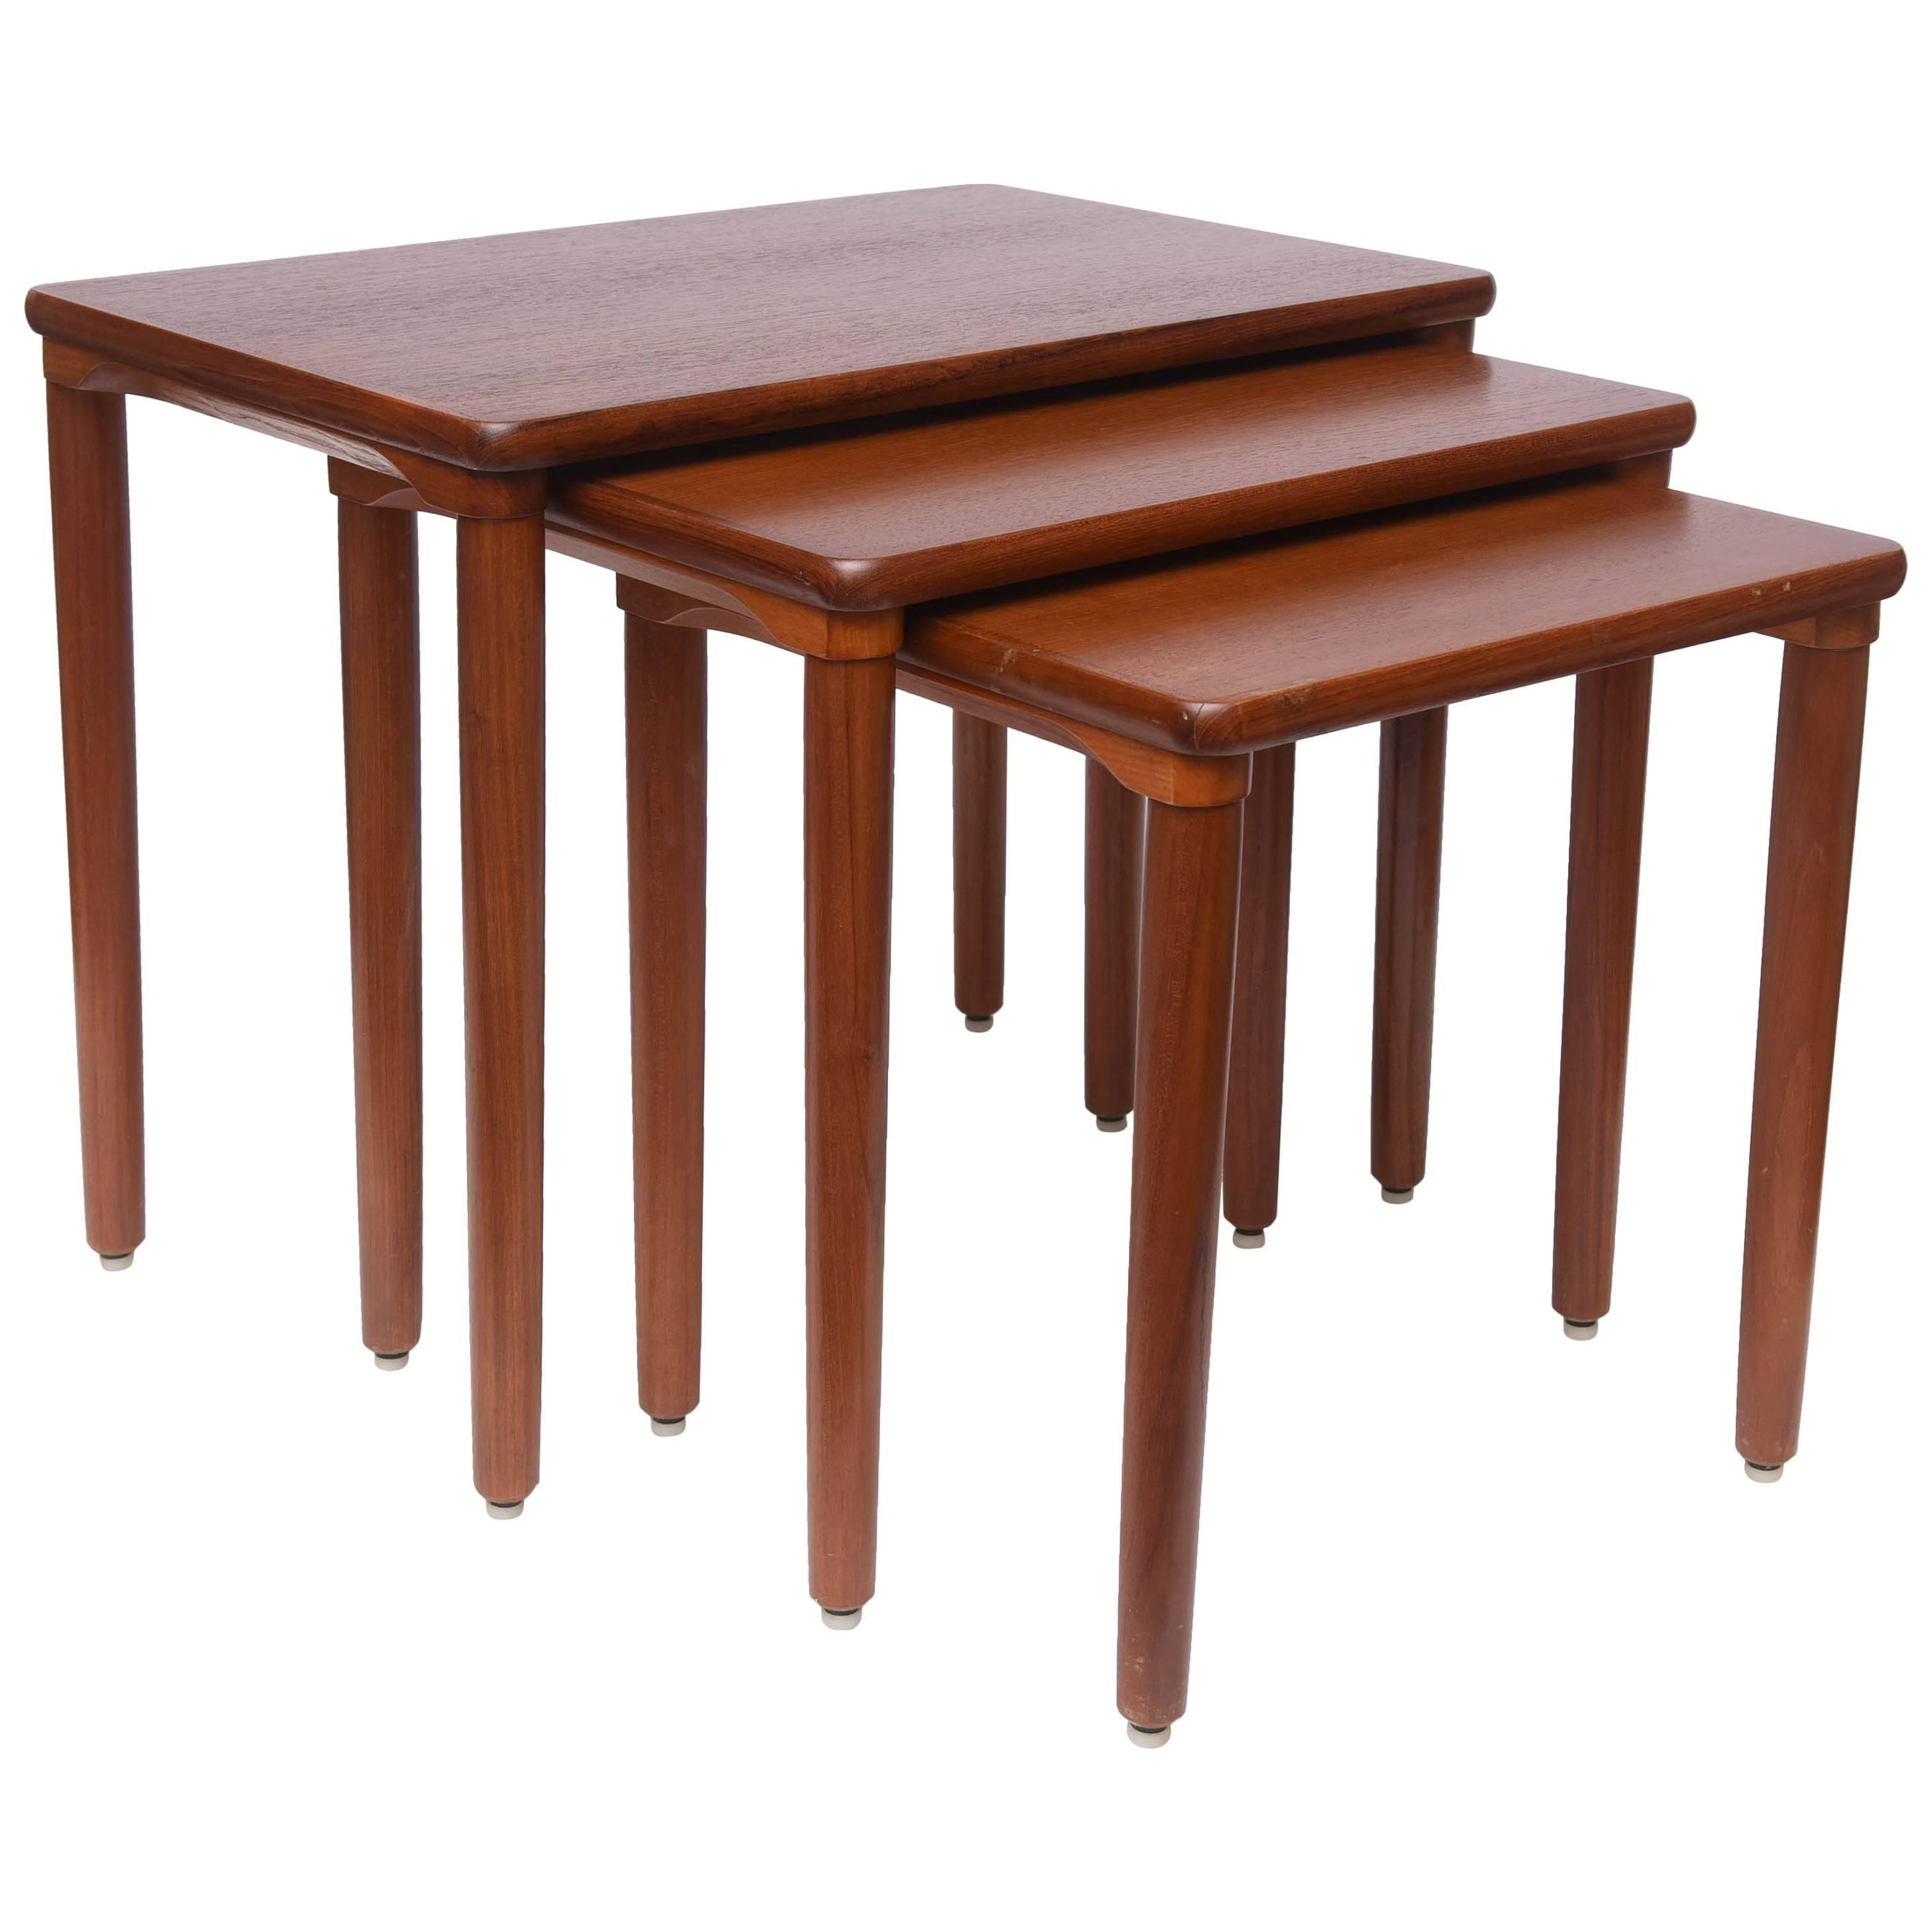 Danish Teak Nesting Tables by EW Bach, 1960s, Denmark